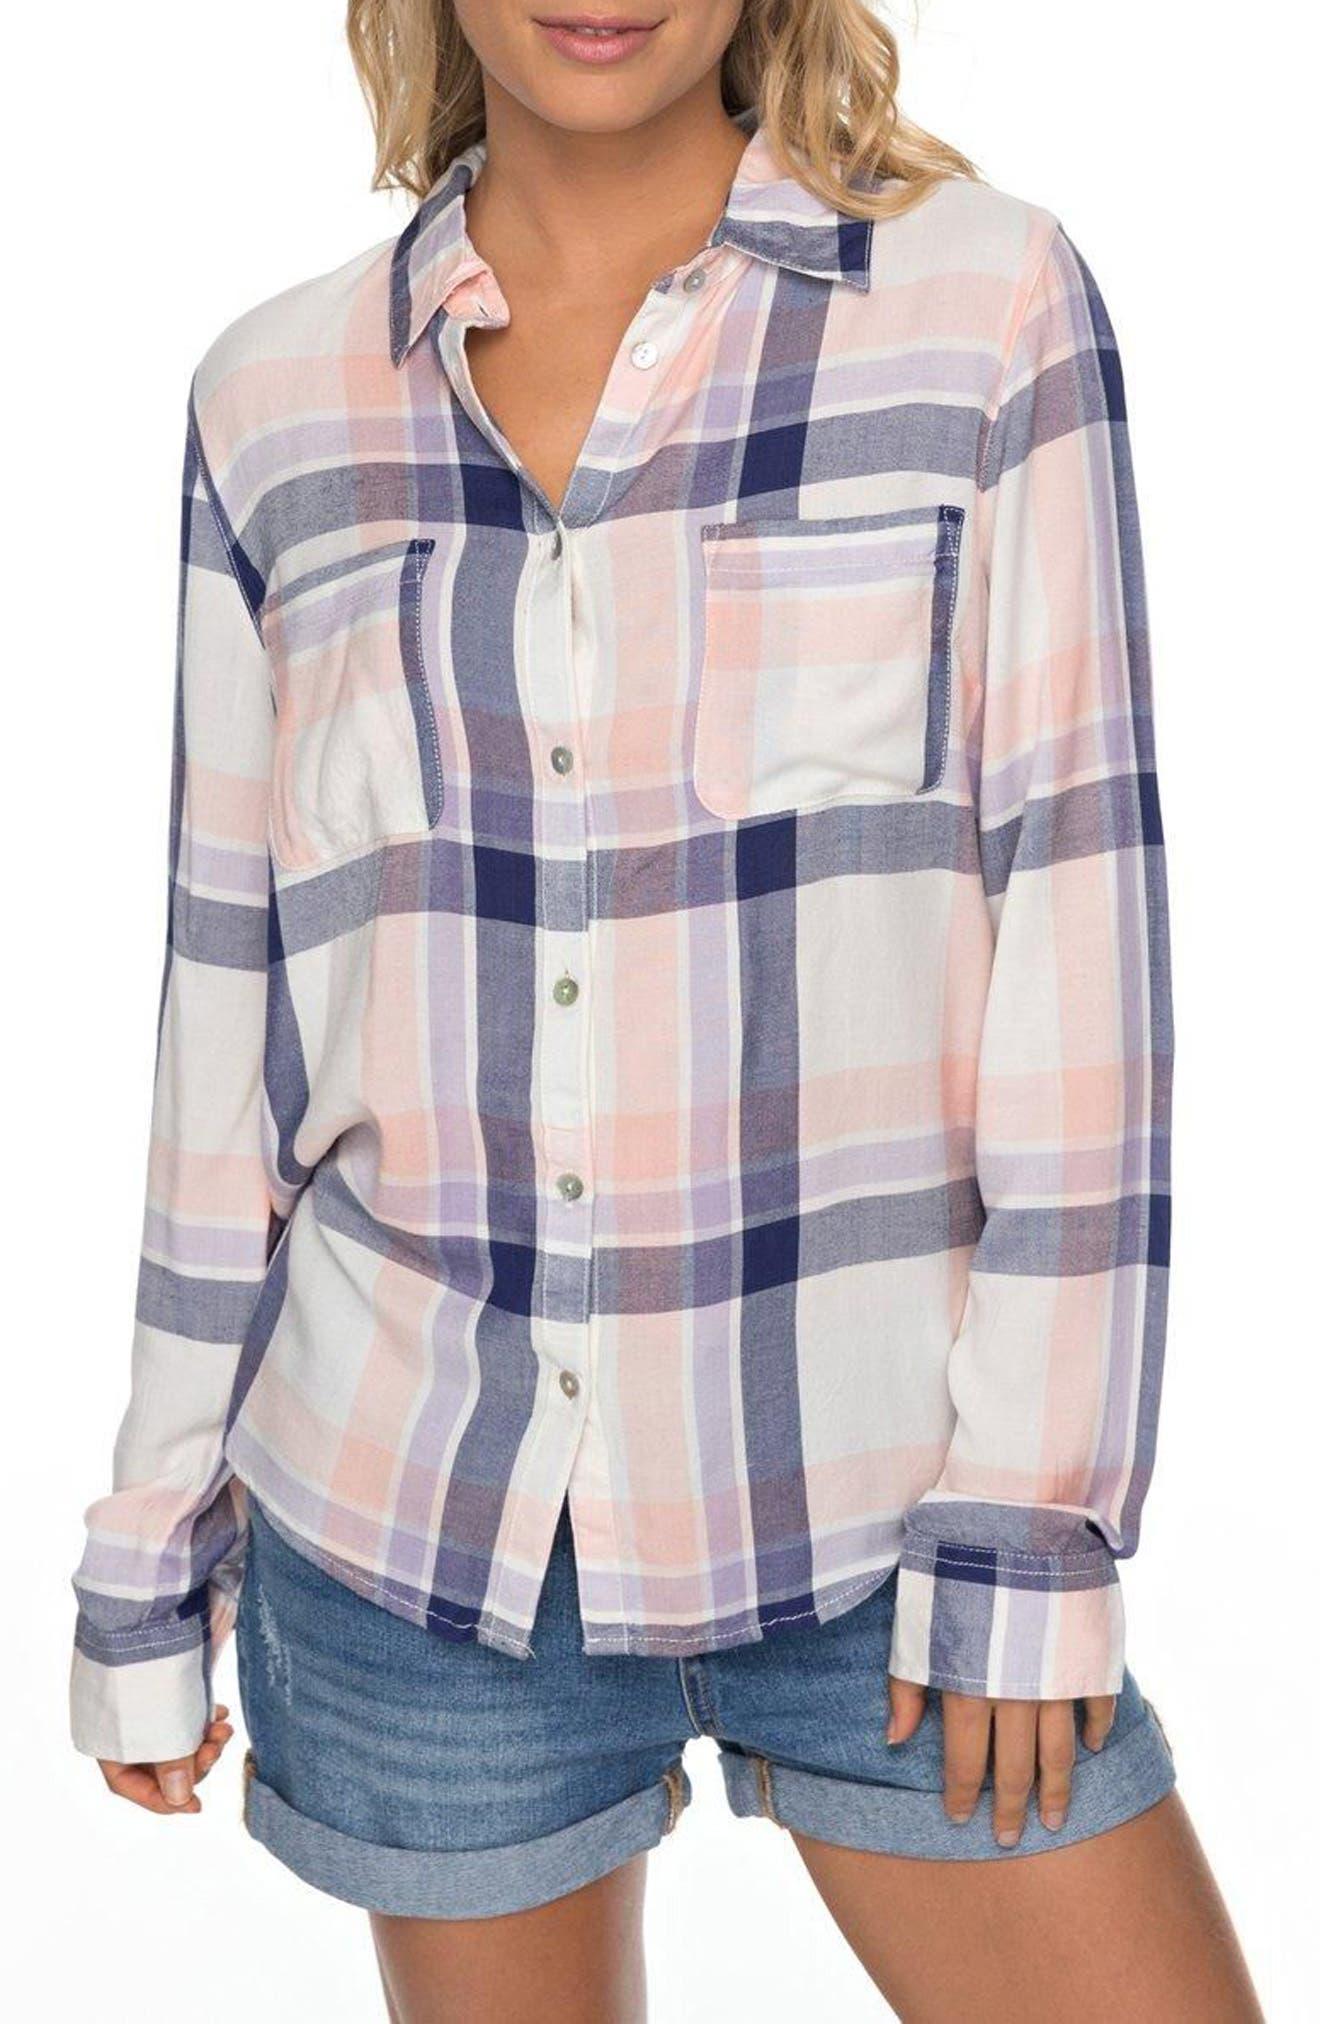 Setai Miami Plaid Shirt,                             Main thumbnail 1, color,                             101